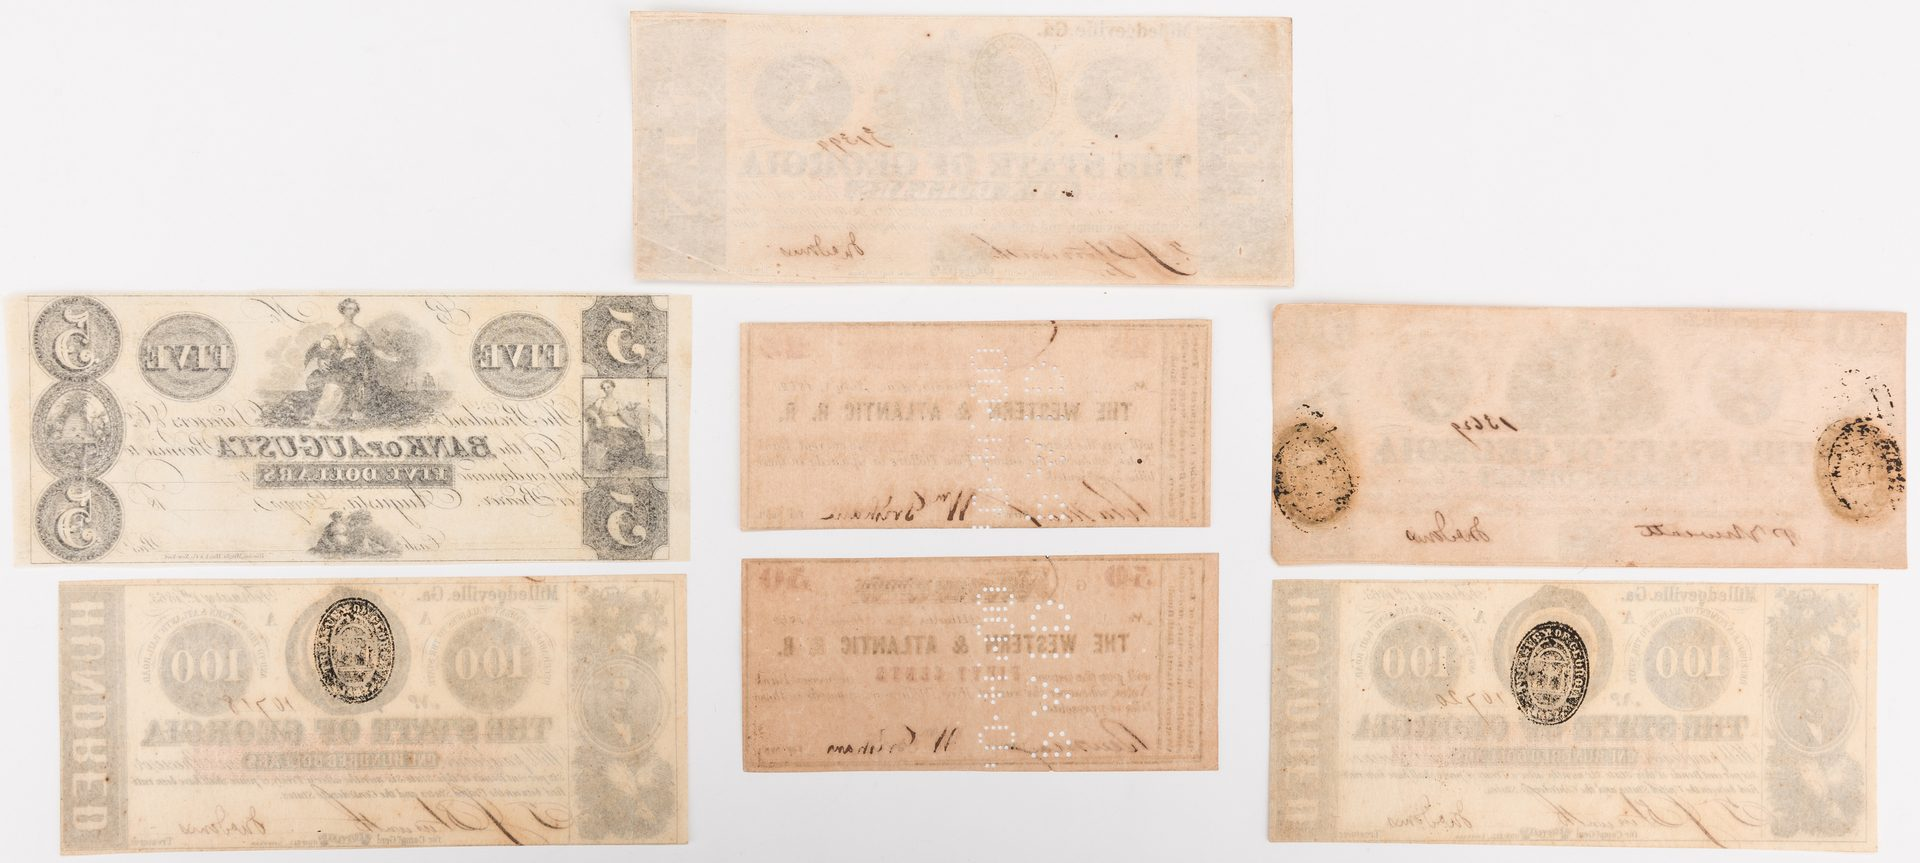 Lot 527: 7 GA Bills, inc. Confederate, Western-Atlantic